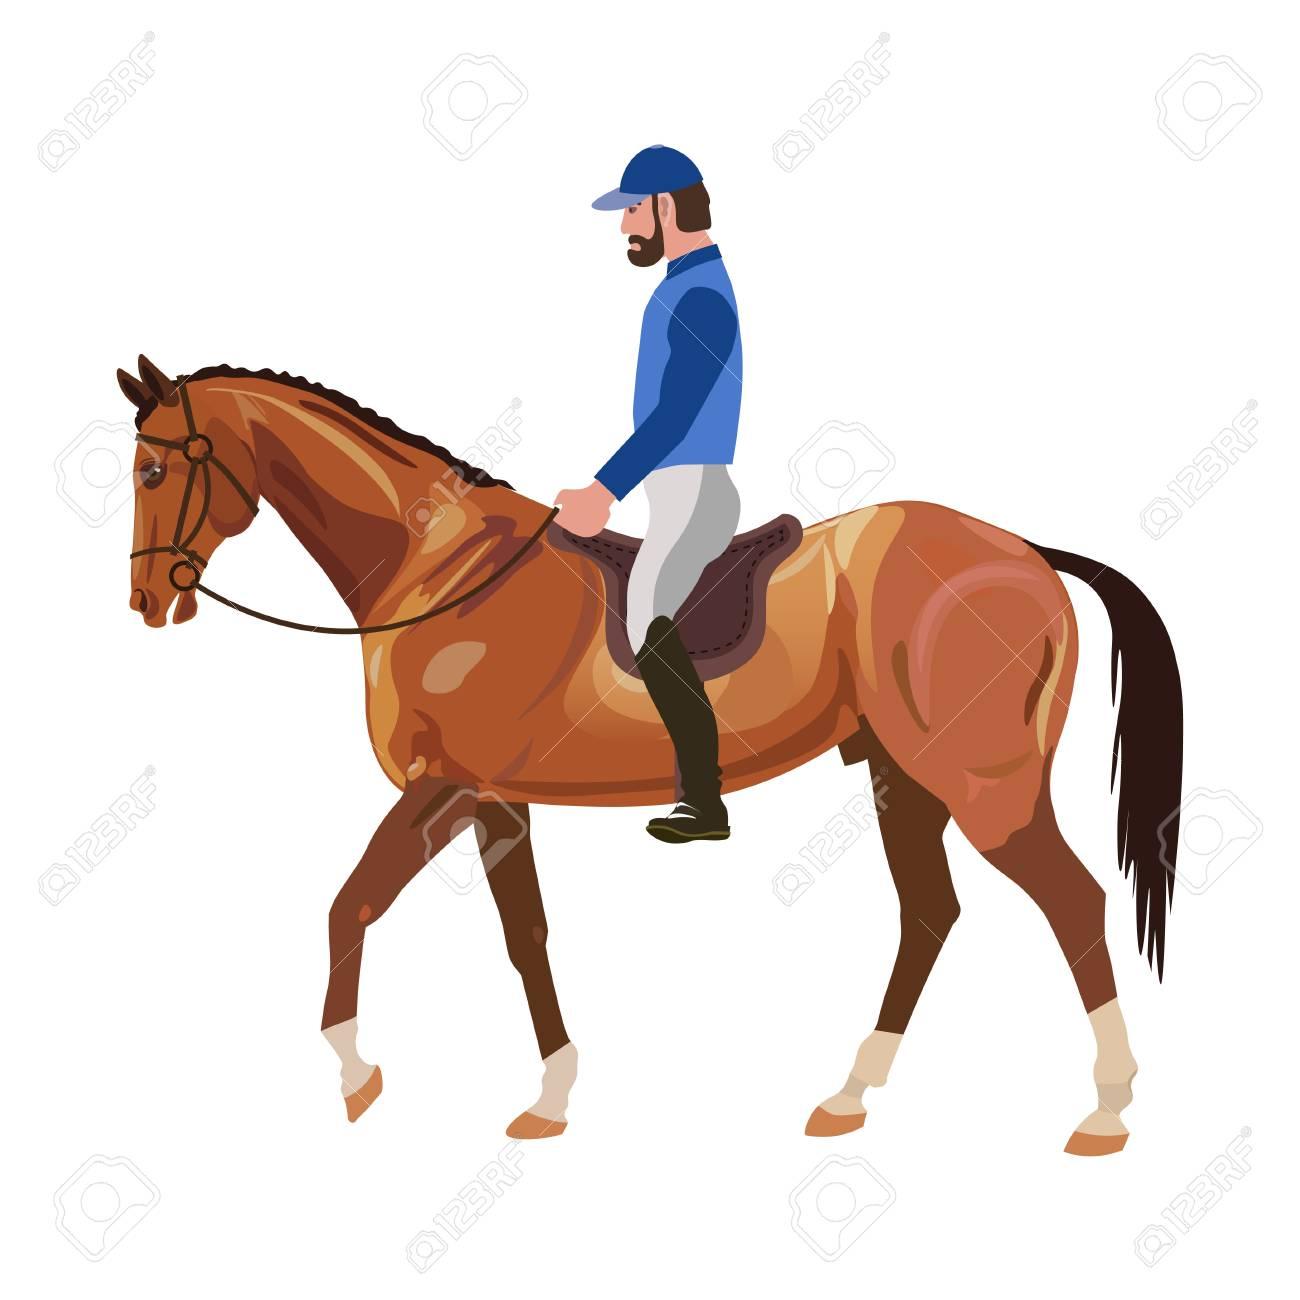 Horseback Rider Vector Illustration Royalty Free Cliparts Vectors And Stock Illustration Image 79937045